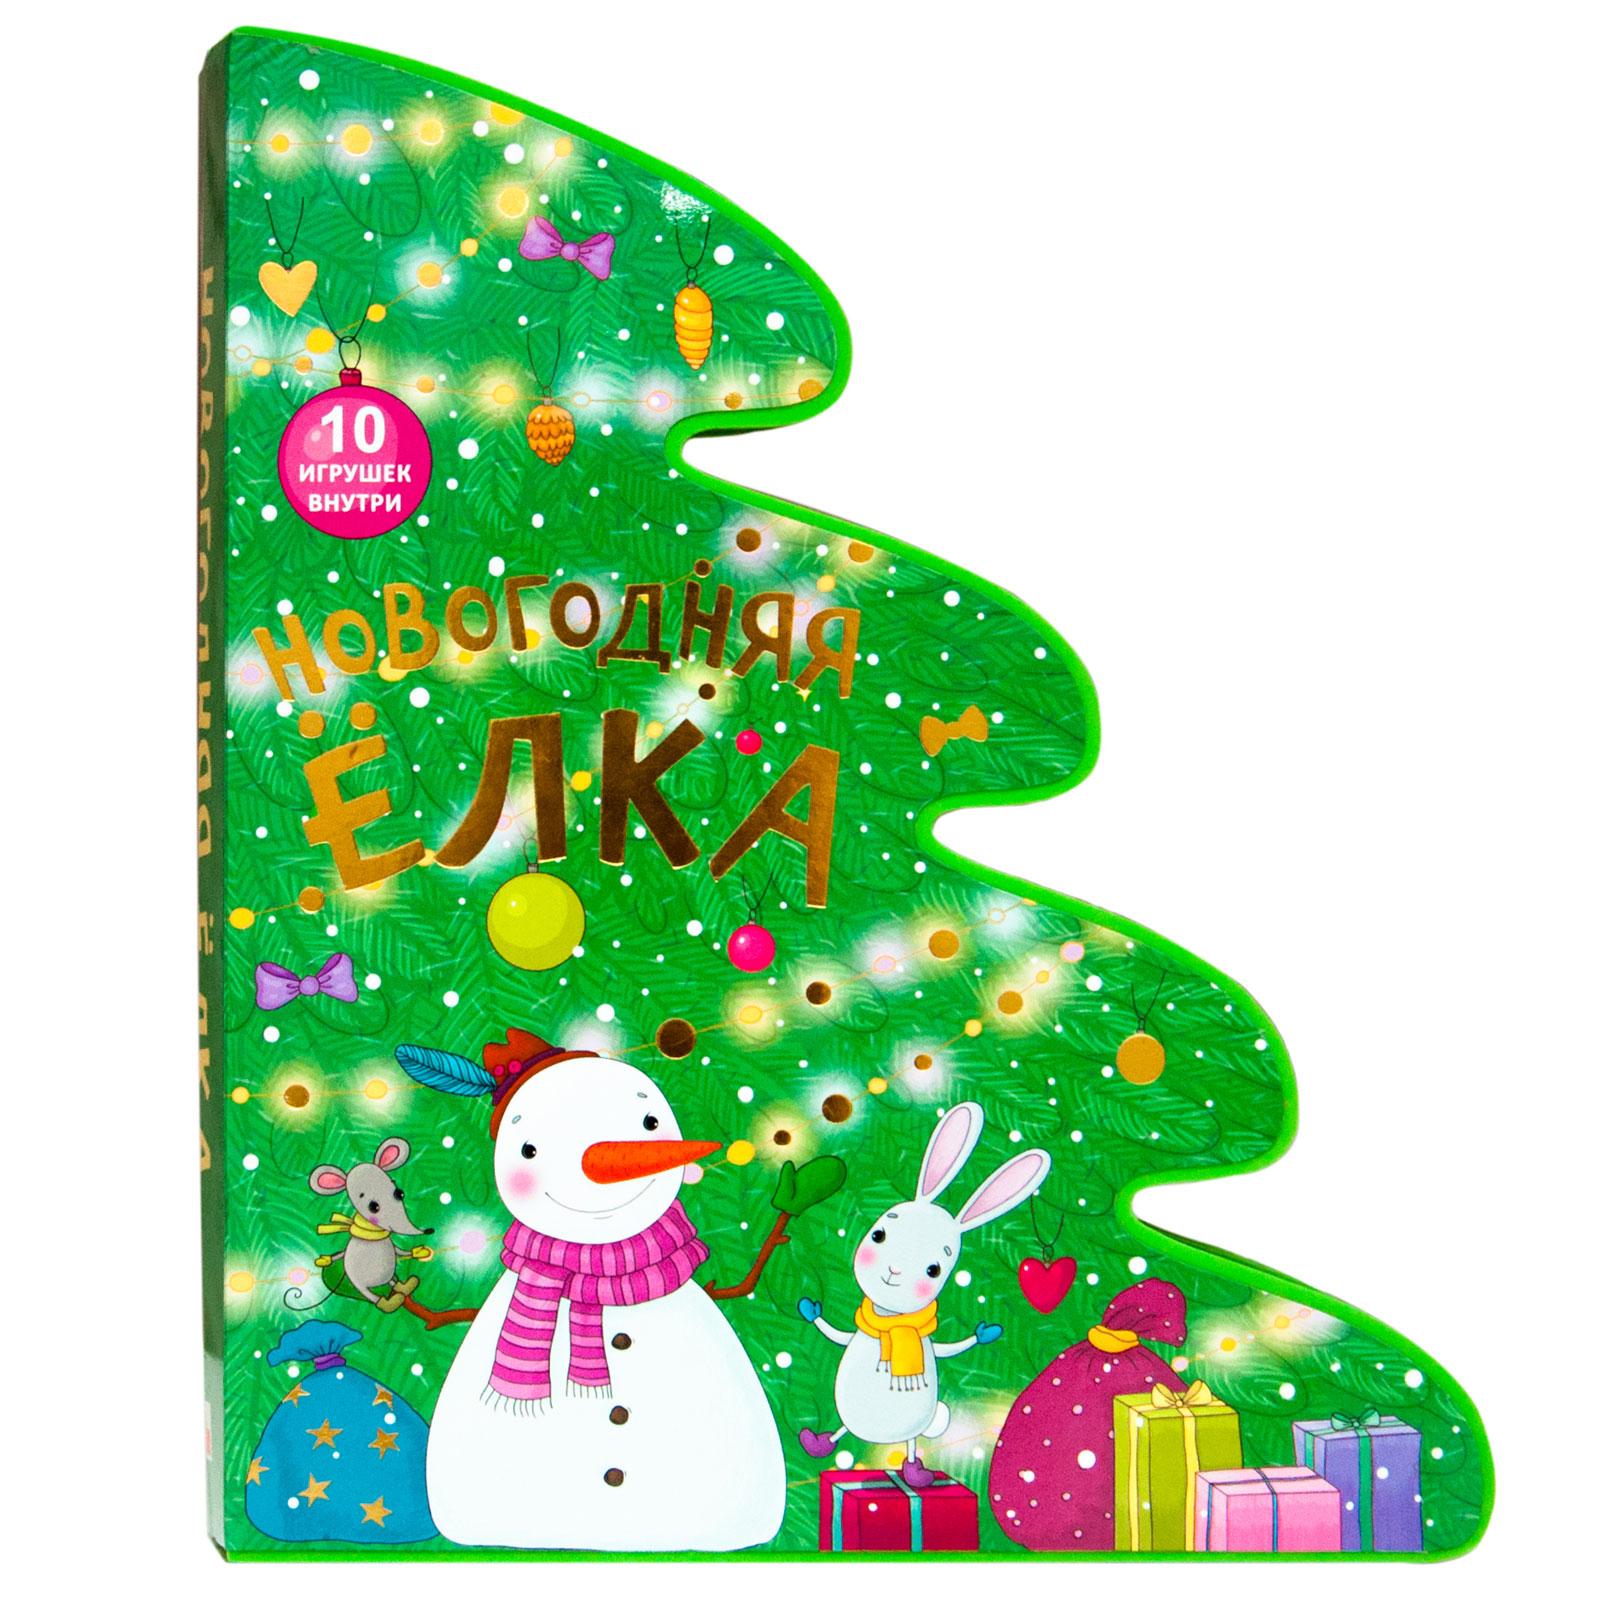 Книга Мозаика-синтез Новогодняя елка (ЕВА)<br>